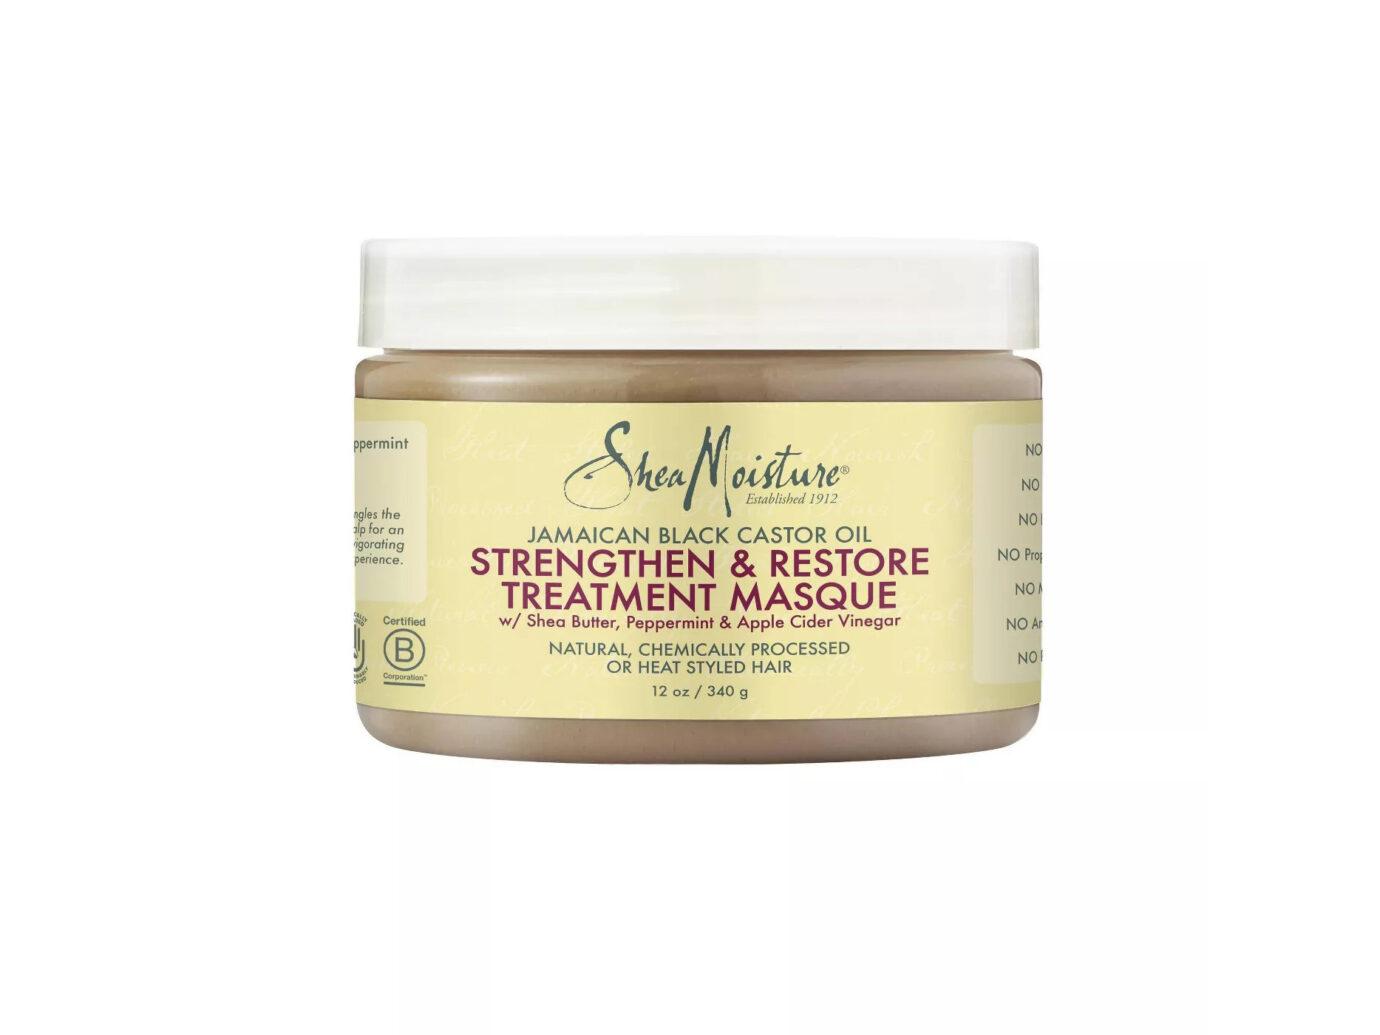 SheaMoisture Jamaican Black Castor Oil Strengthen & Restore Treatment Masque